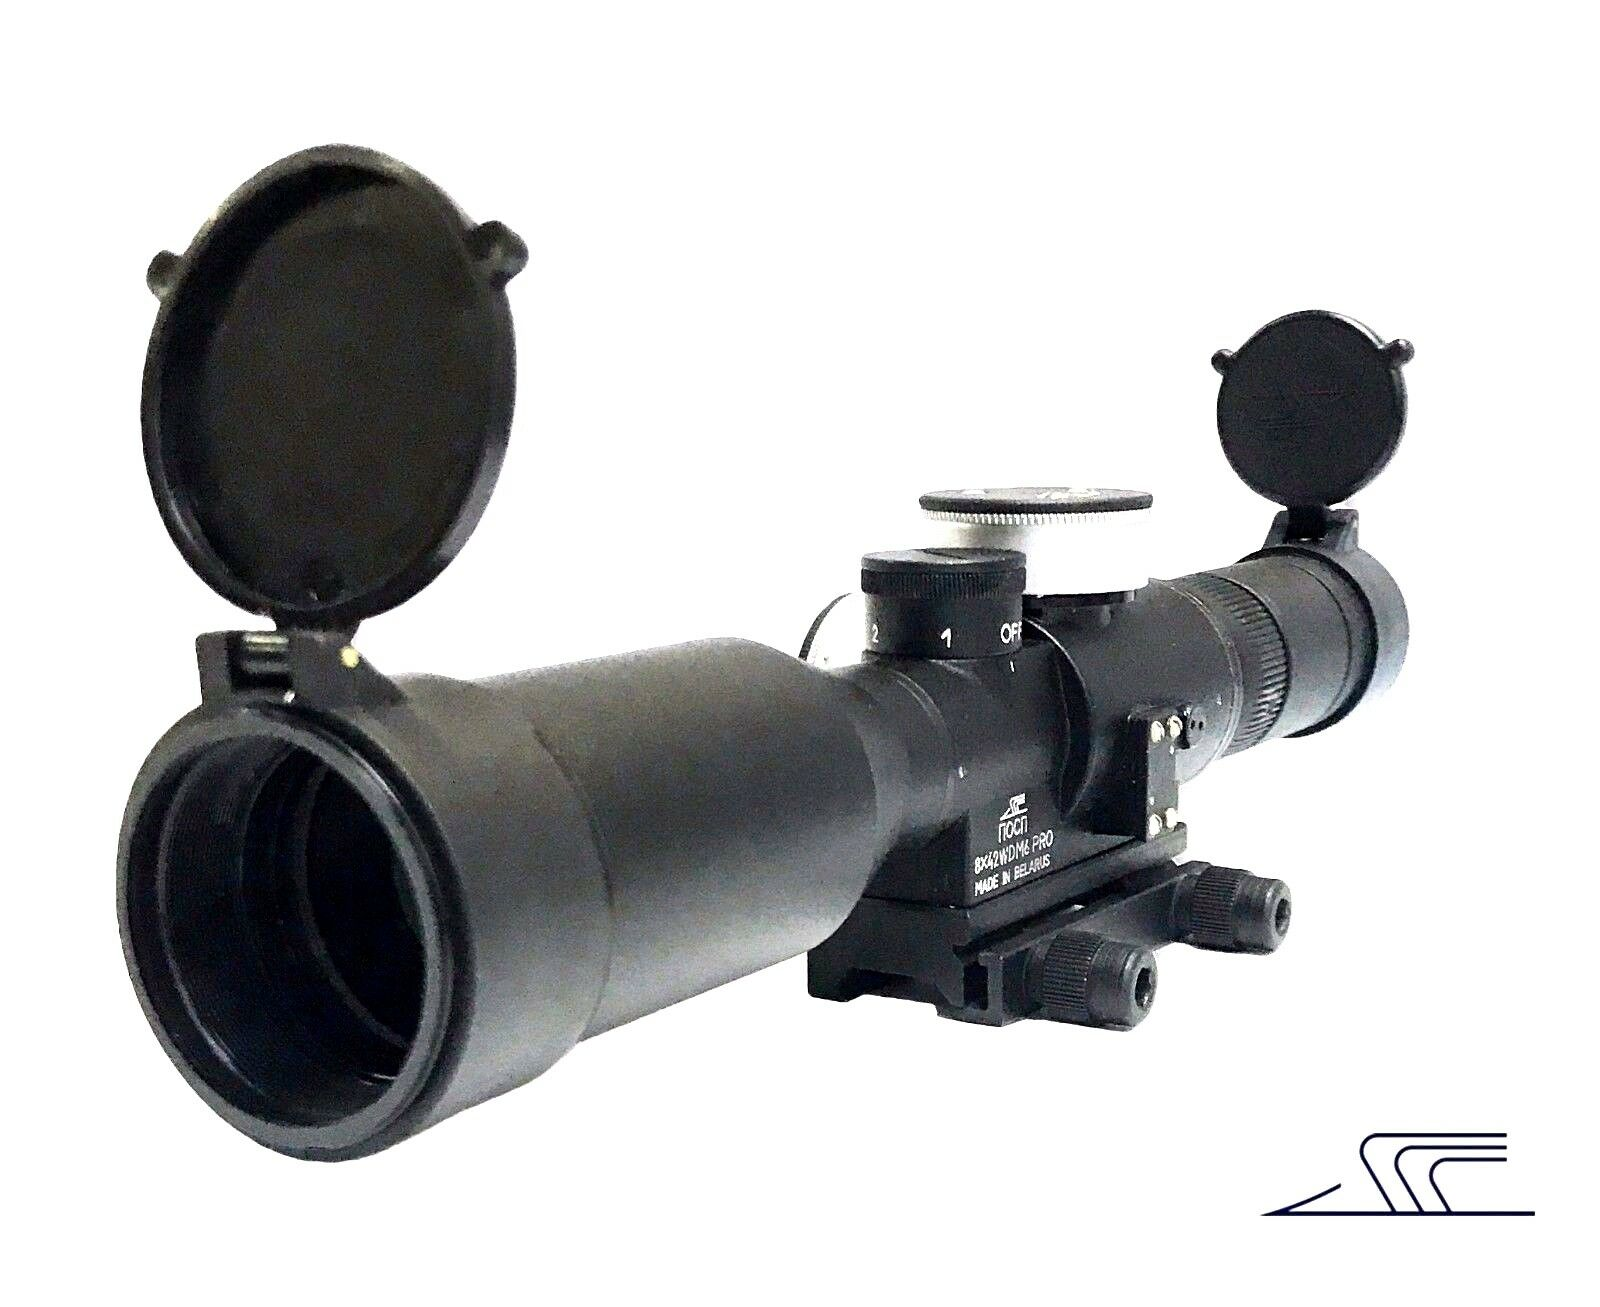 RUSSIAN BelOMO POSP 8x42 WDM6 PRO Sniper Rifle Scope Optical Sight Weaver Mount